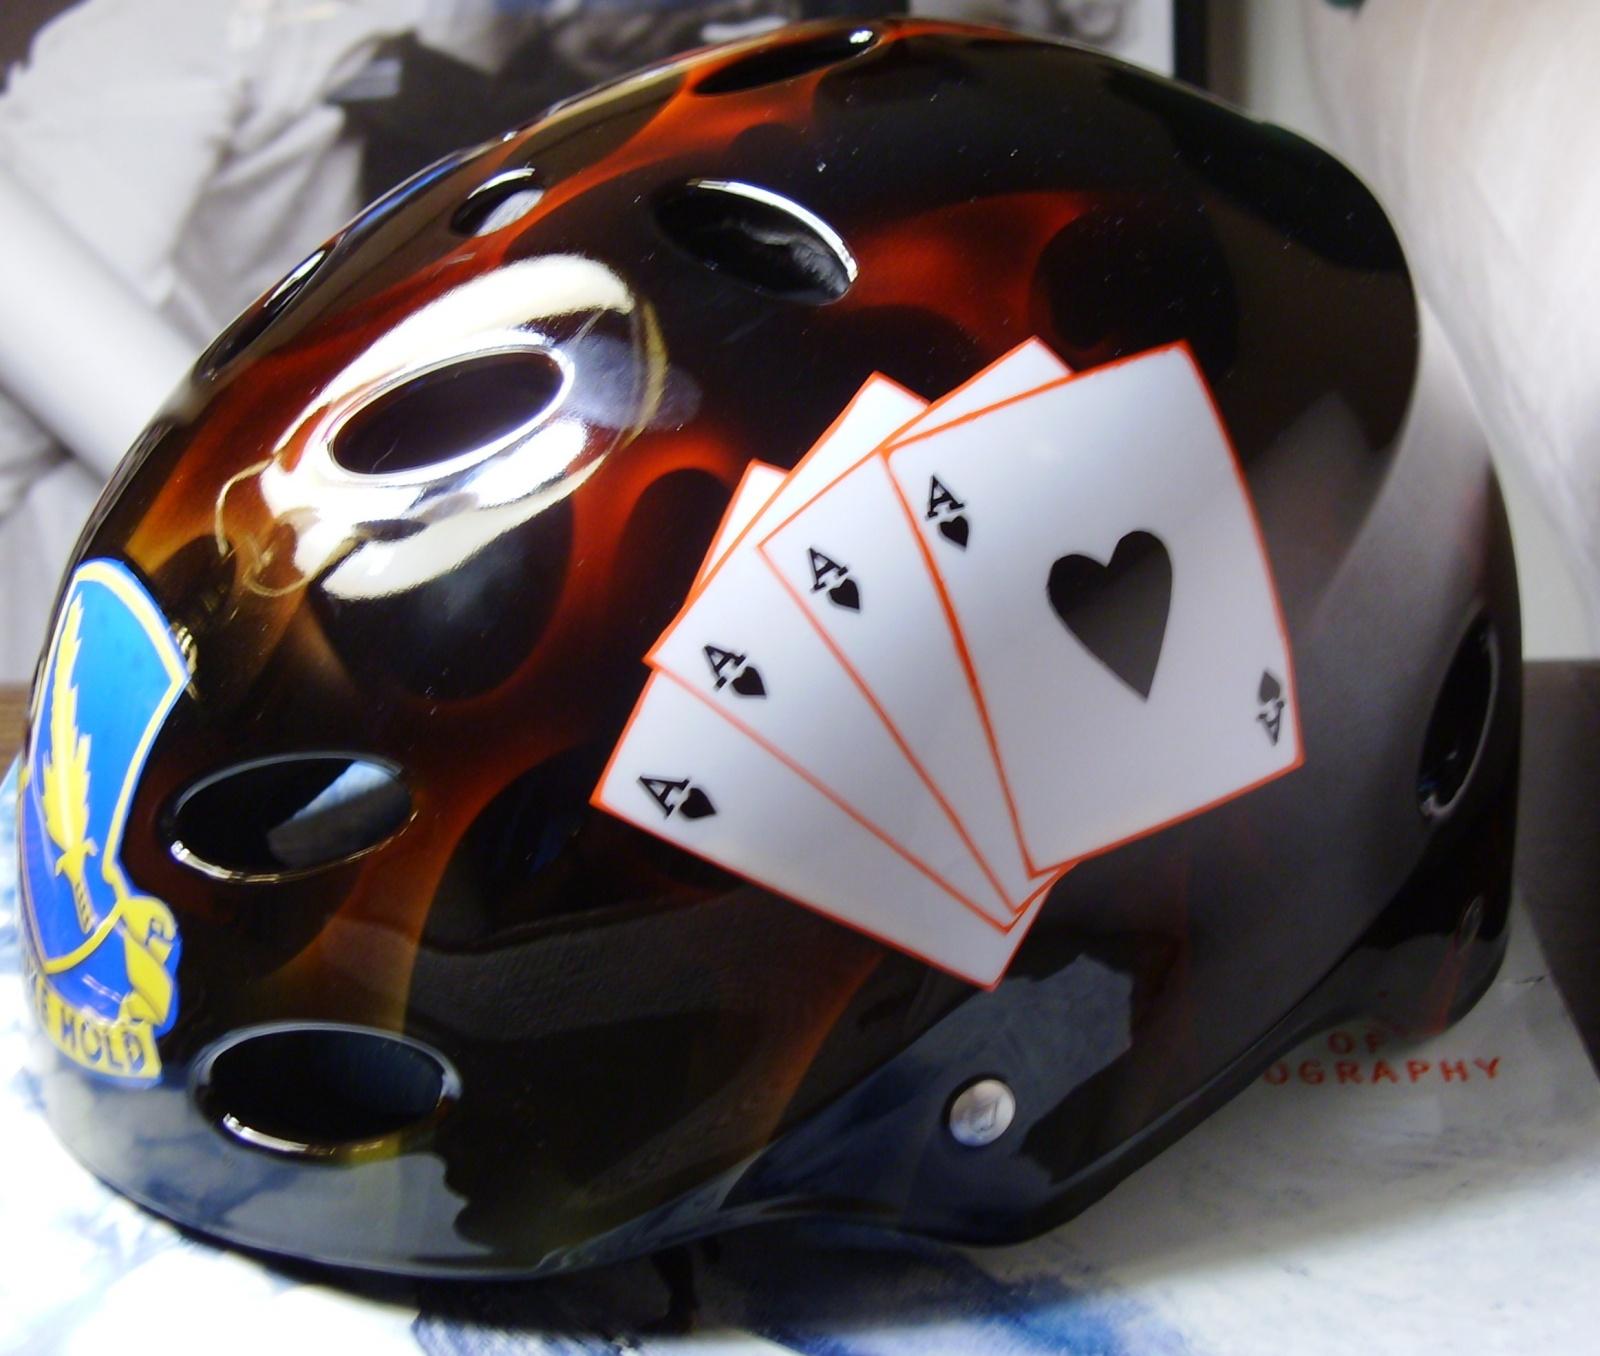 Click image for larger version  Name:Custom kayak helmet 016.jpg Views:633 Size:442.8 KB ID:844